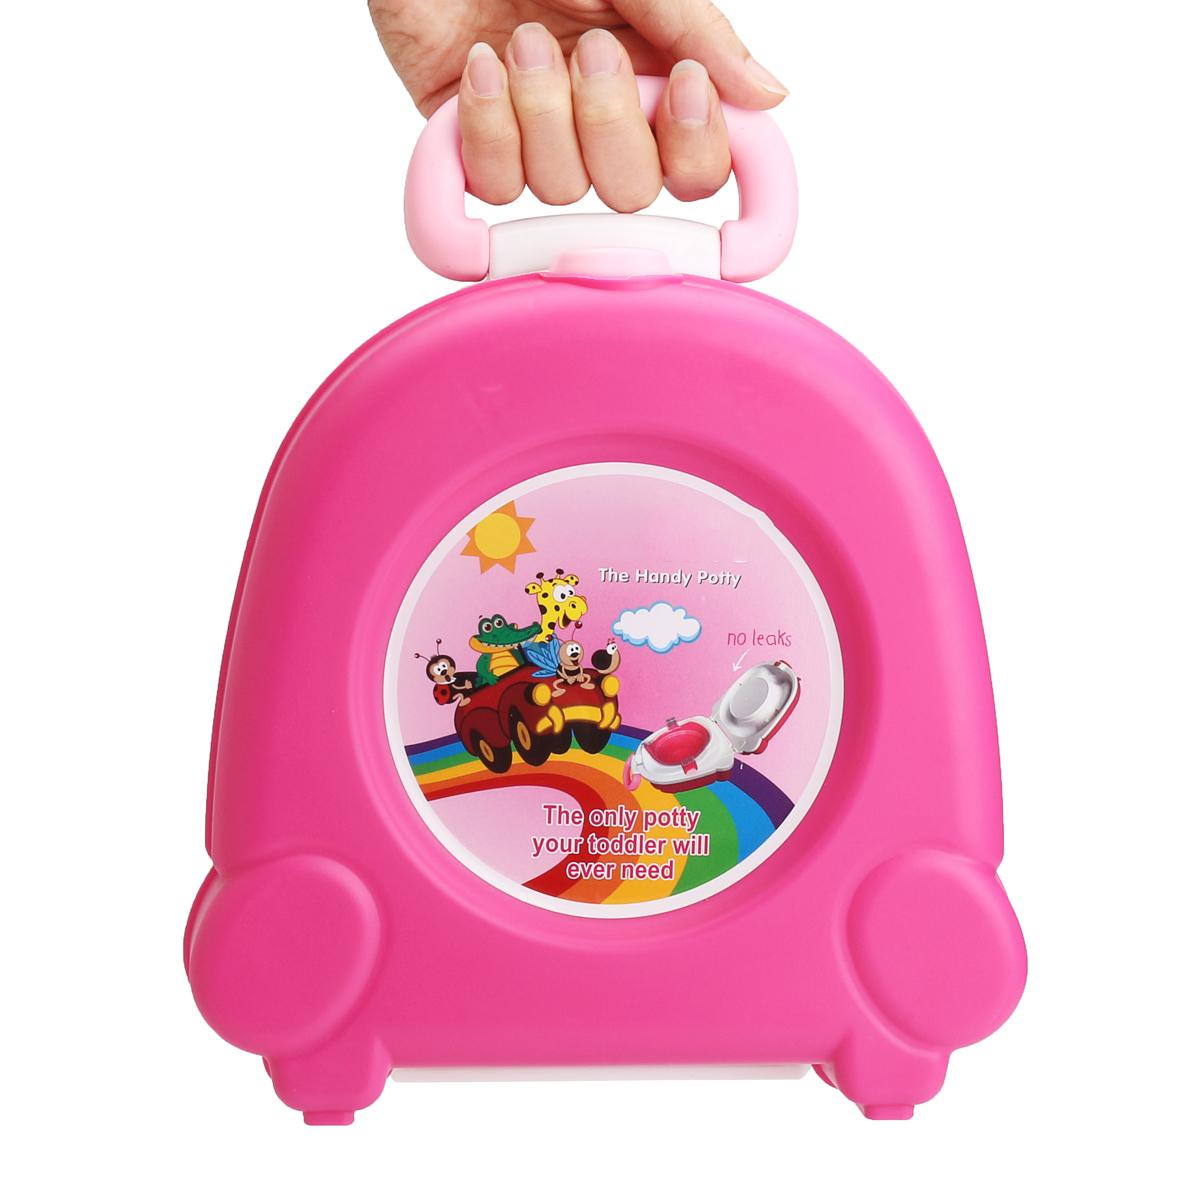 Kid Baby Toddler Toilet Portable Training Seat Travel Potty Urinal Pee Pot Chair · 8de389fd-edb9-448d-a8b8-c64229c2e2dd.jpg ...